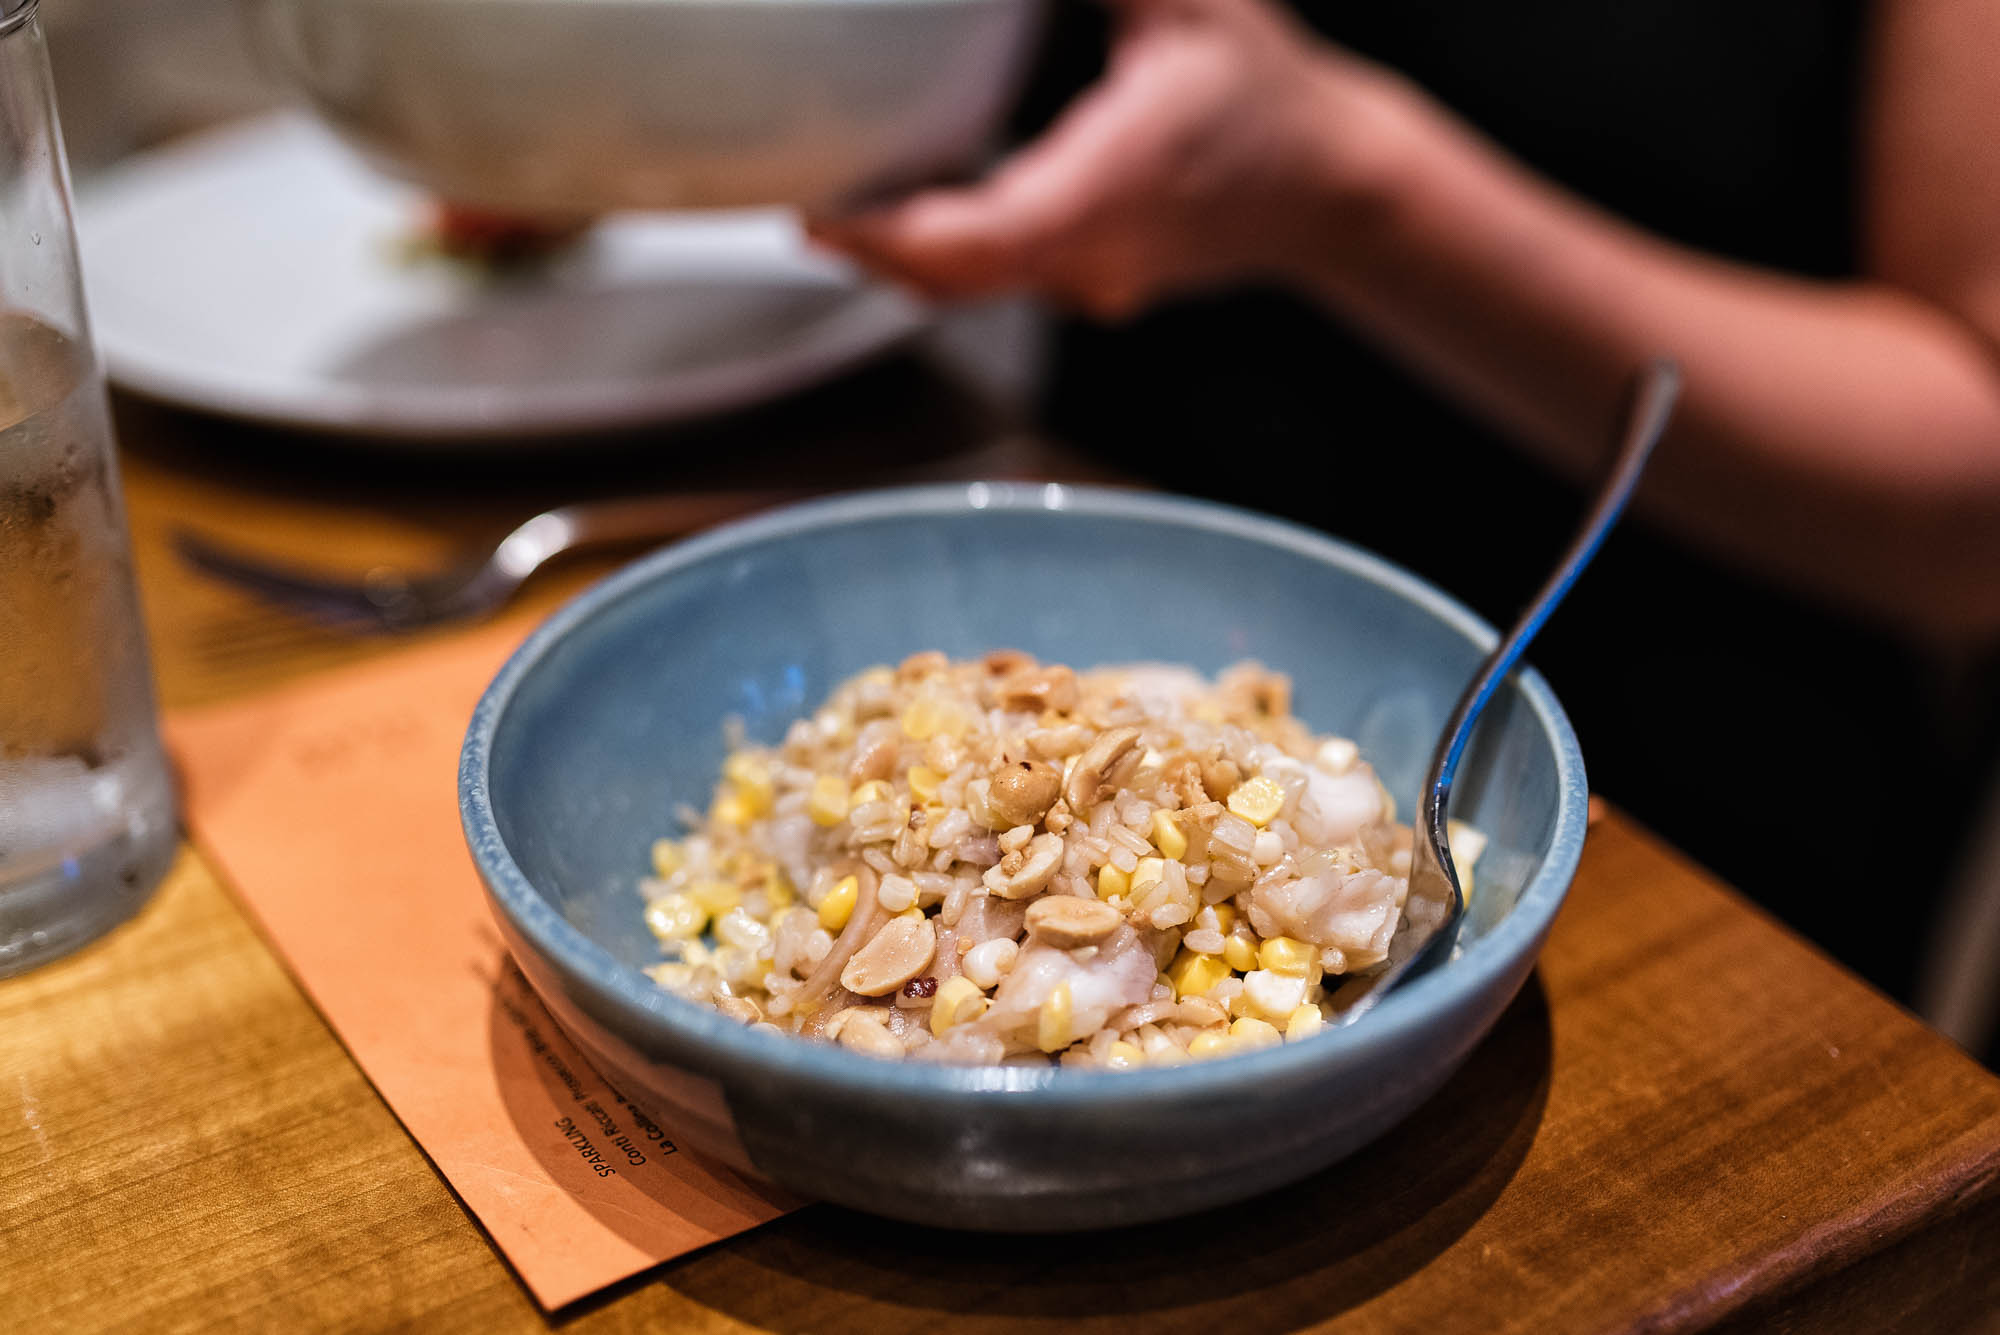 Catfish salad - corn, rice, smoked catfish, fish sauce, cider vinegar, peanuts